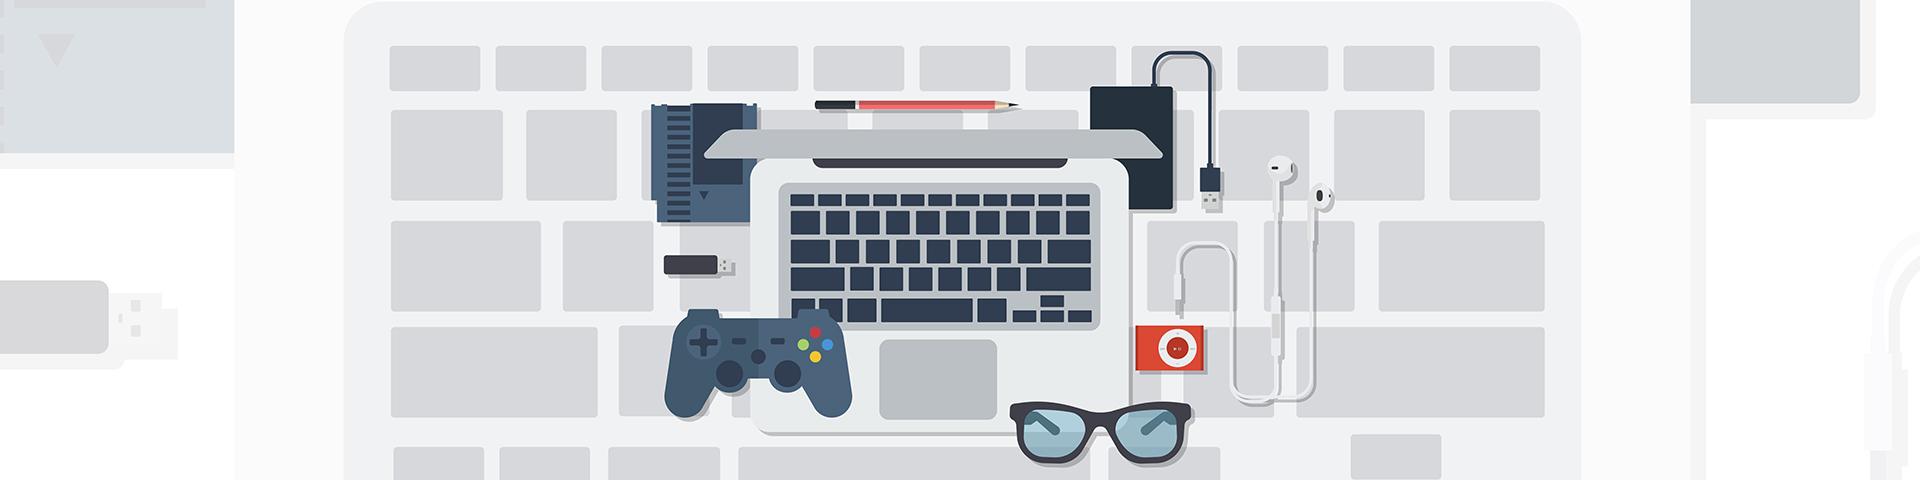 Geek-Toolkit